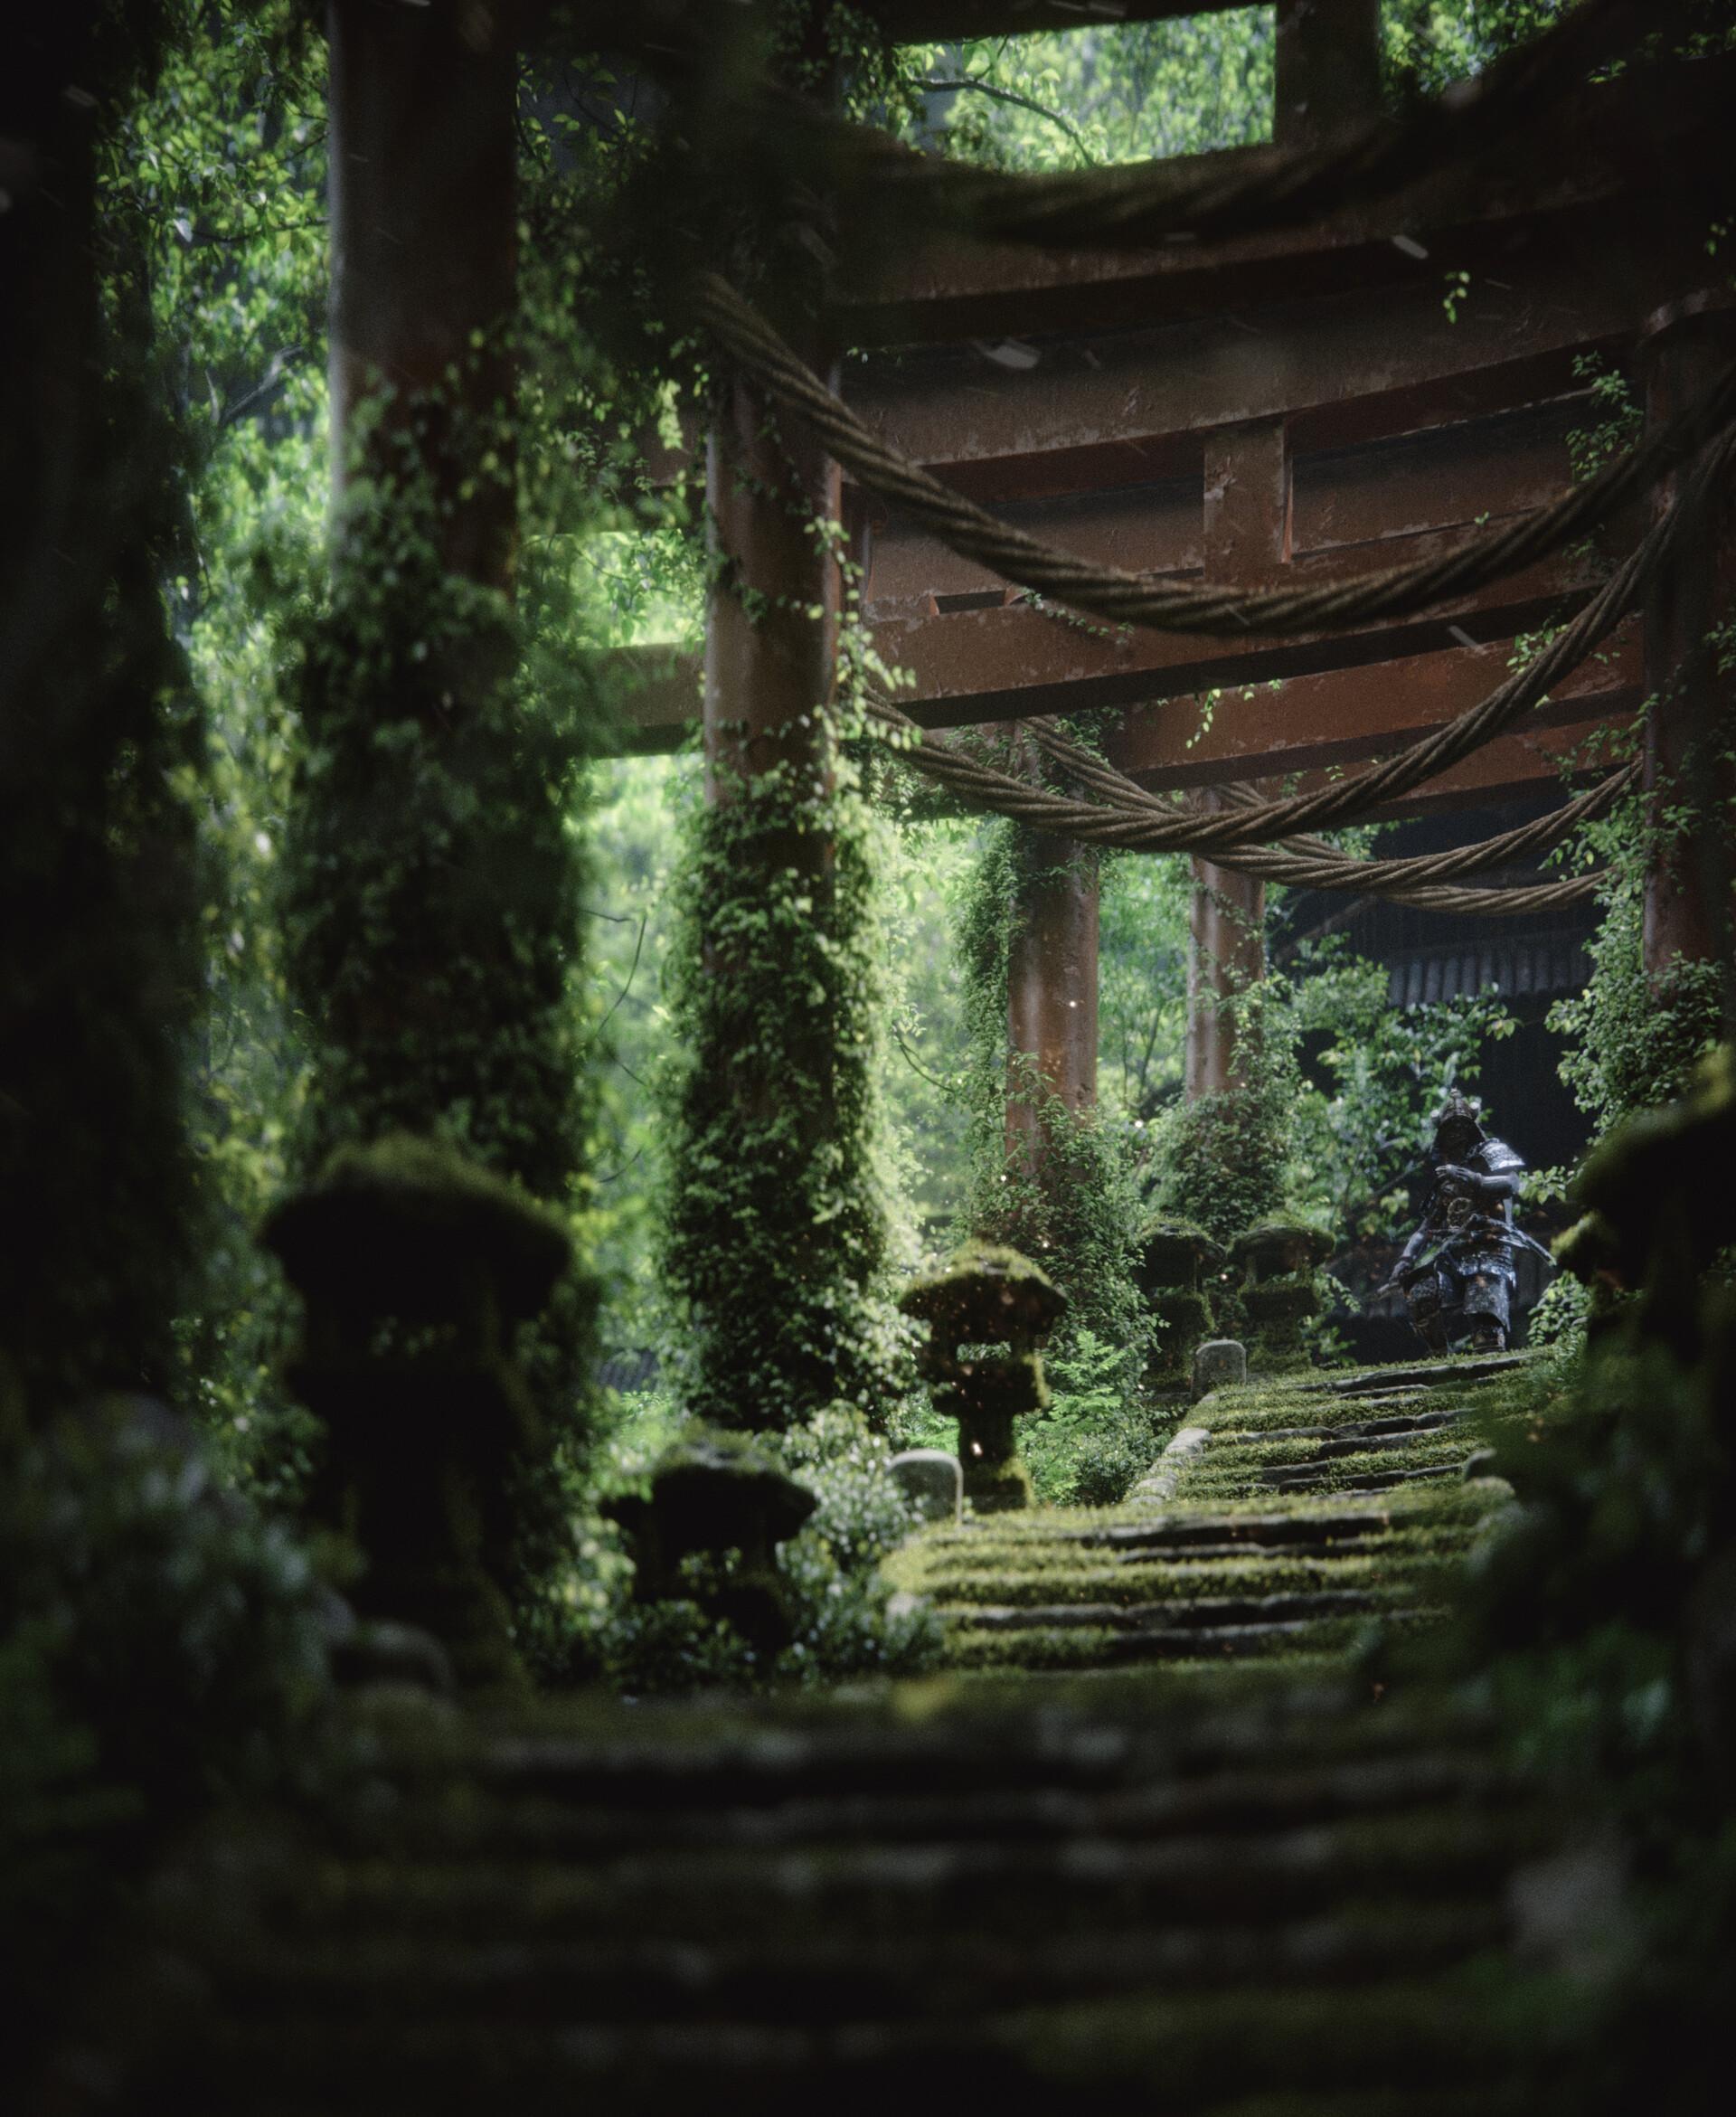 https://cdnb.artstation.com/p/assets/images/images/025/758/917/large/ryan-coyoca-shogun.jpg?1586841003